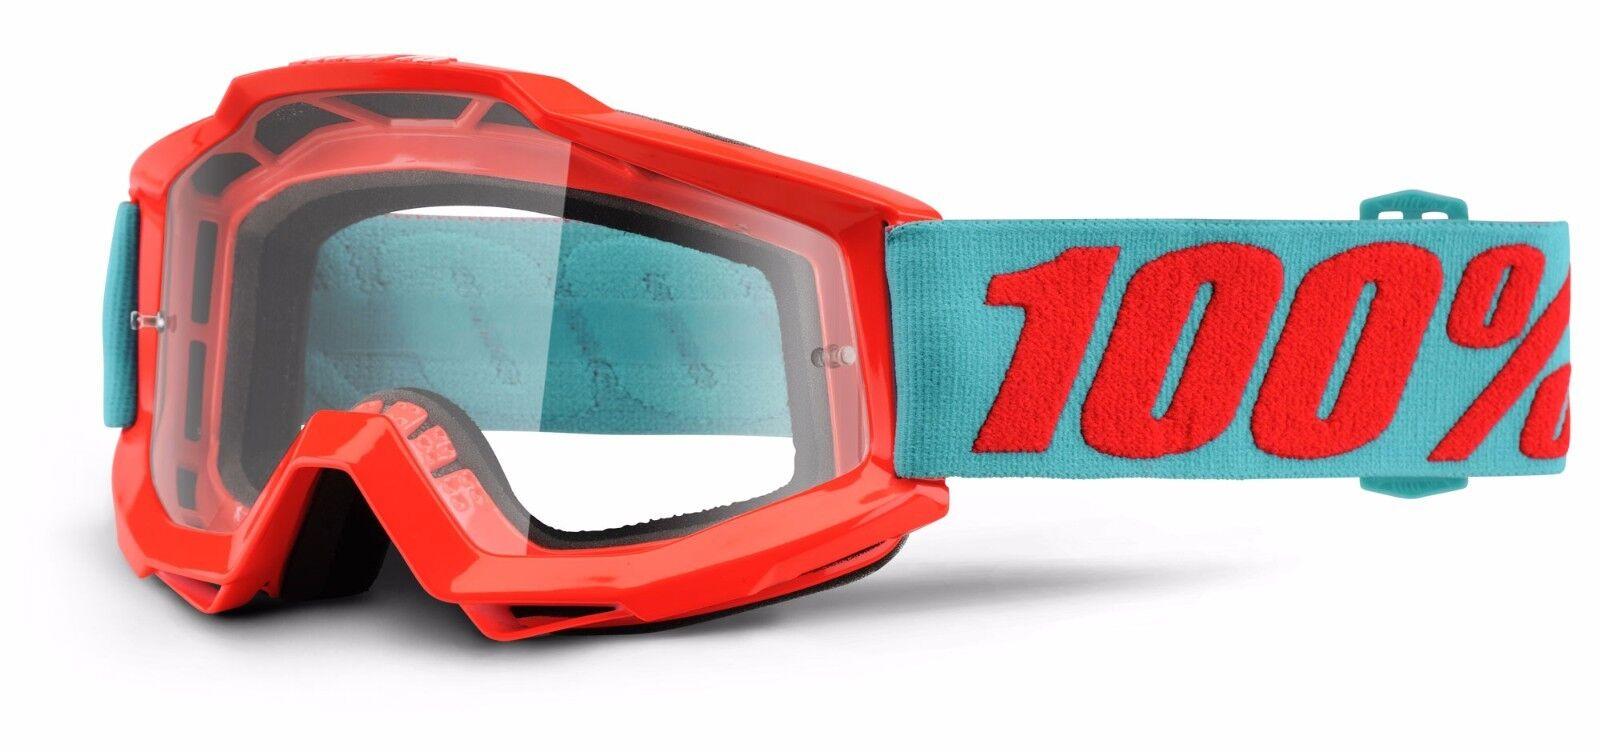 100% Accuri Occhiali-Tutti i colori-Clear Lens-MX Motocross Motocross Lens-MX MTB ENDURO TRAIL 83576b